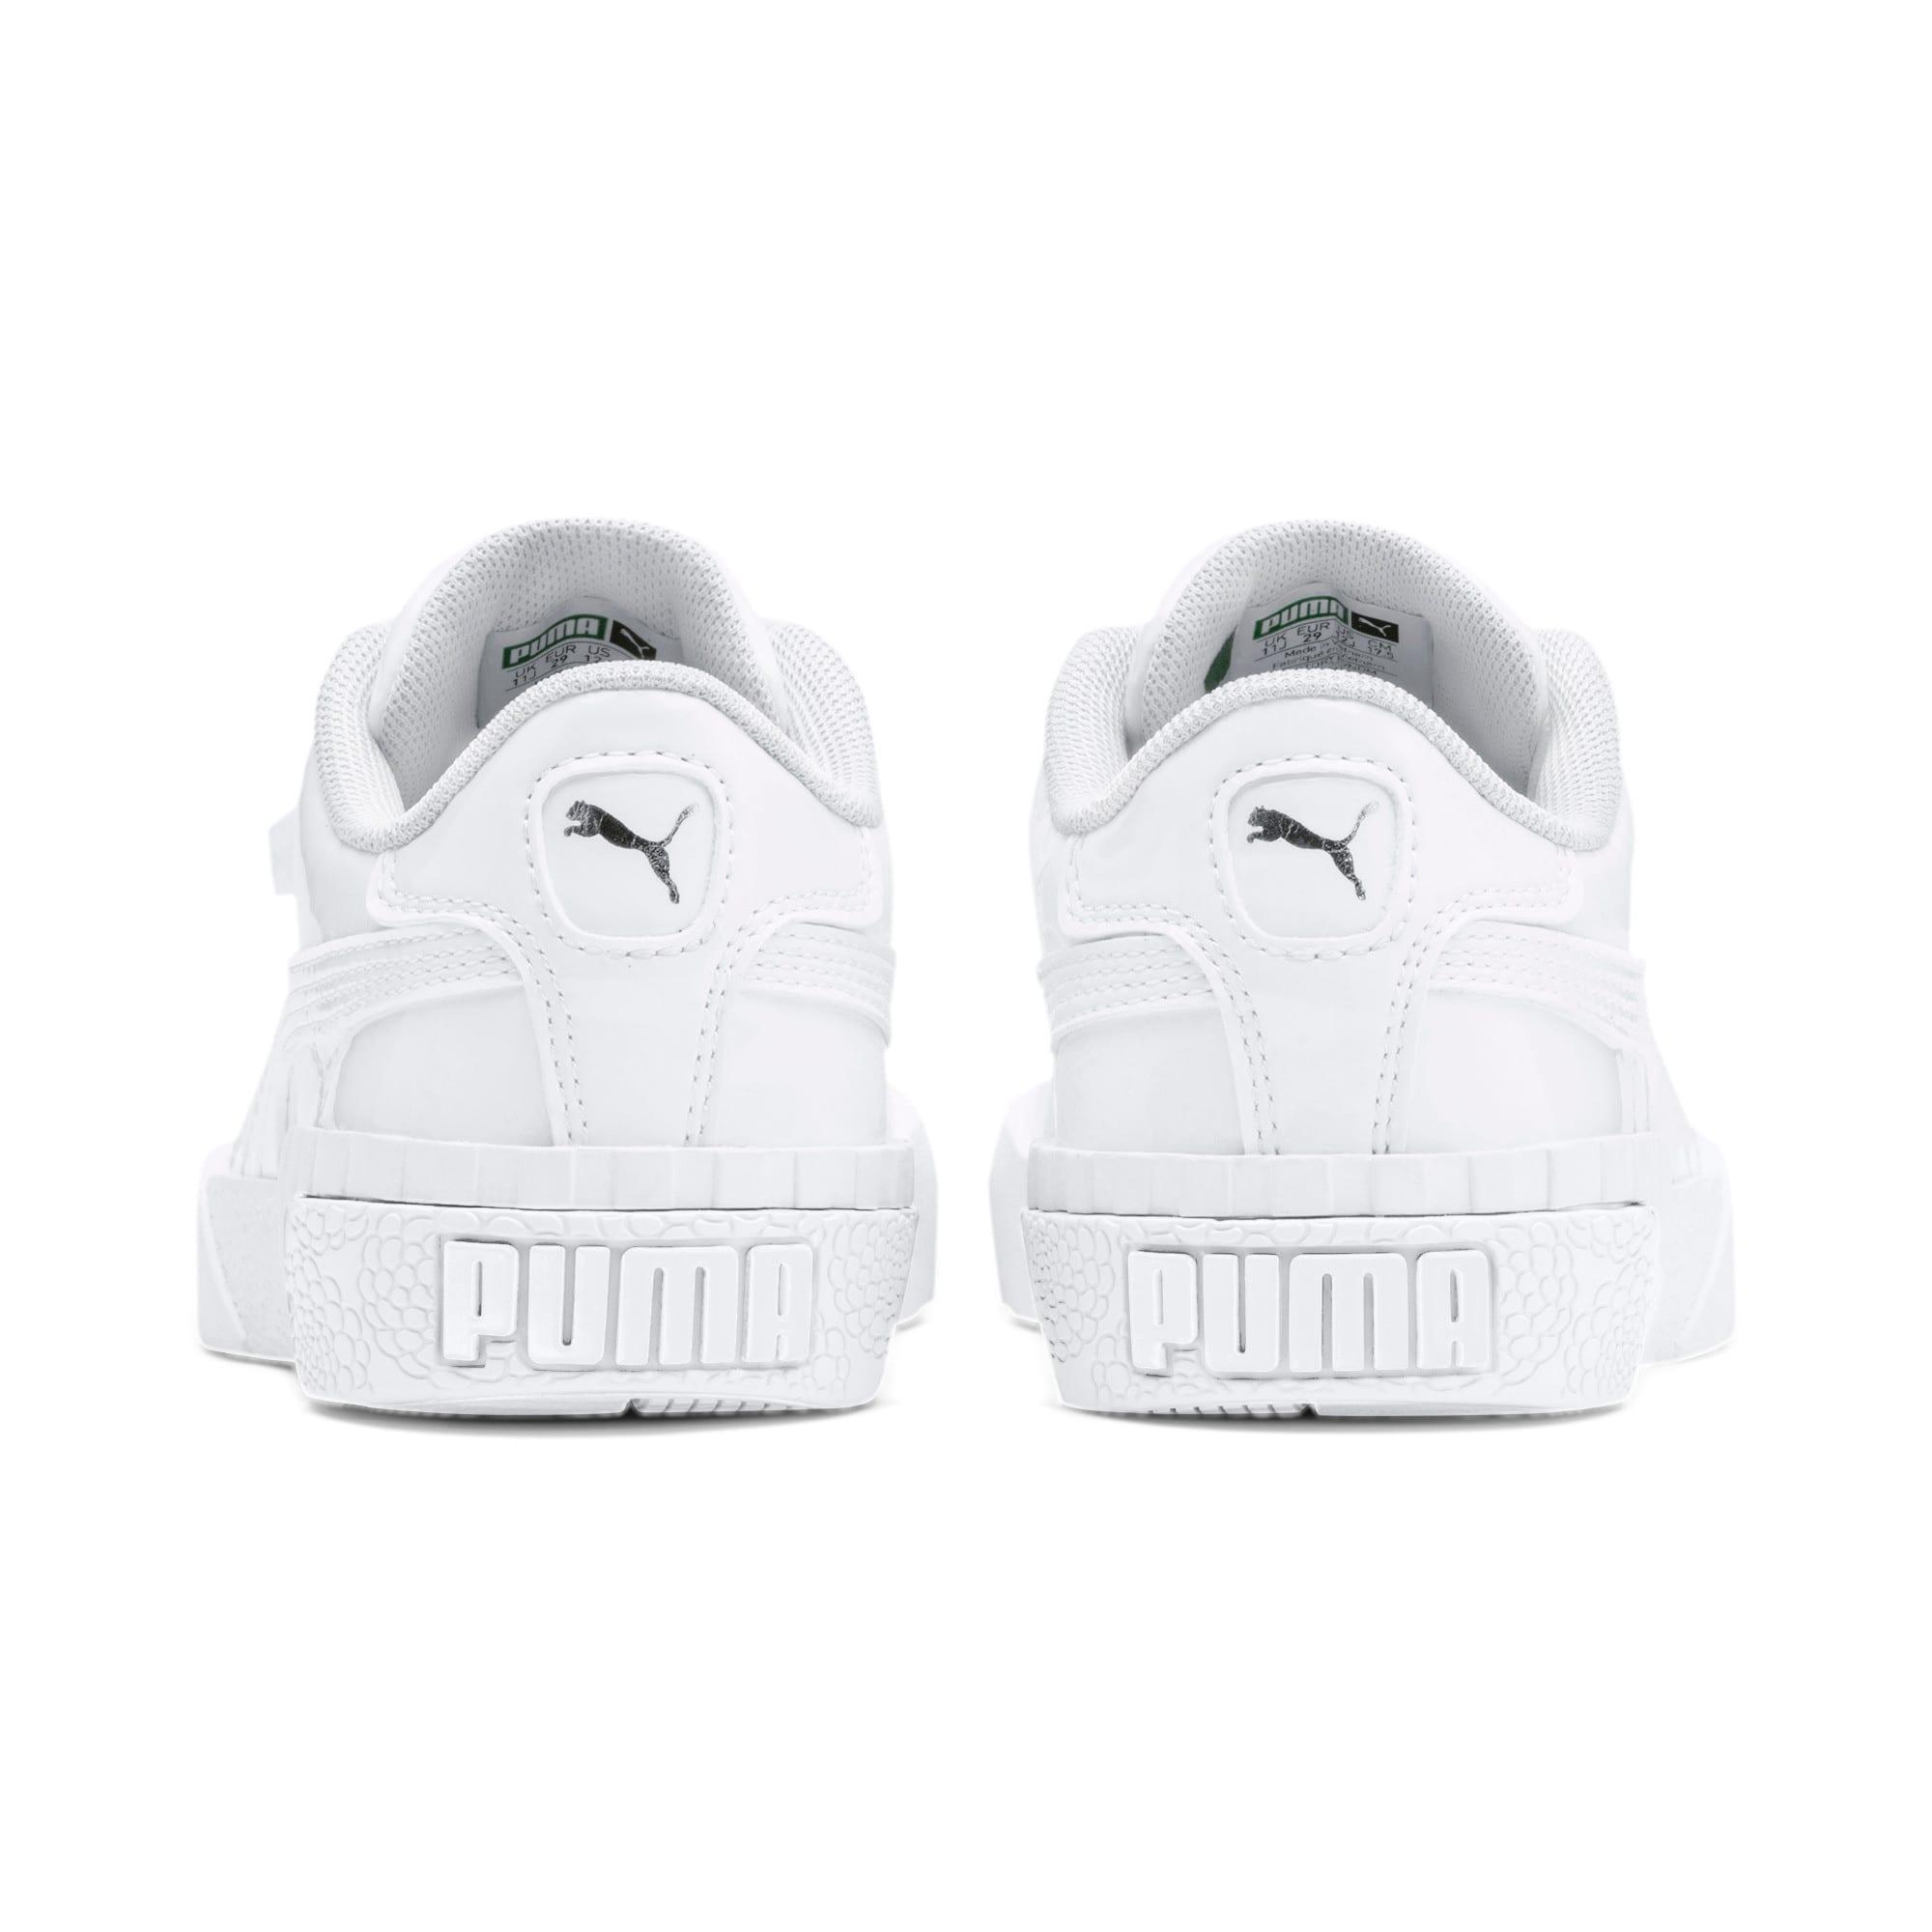 Thumbnail 3 of Cali Patent Kids' Trainers, Puma White-Puma White, medium